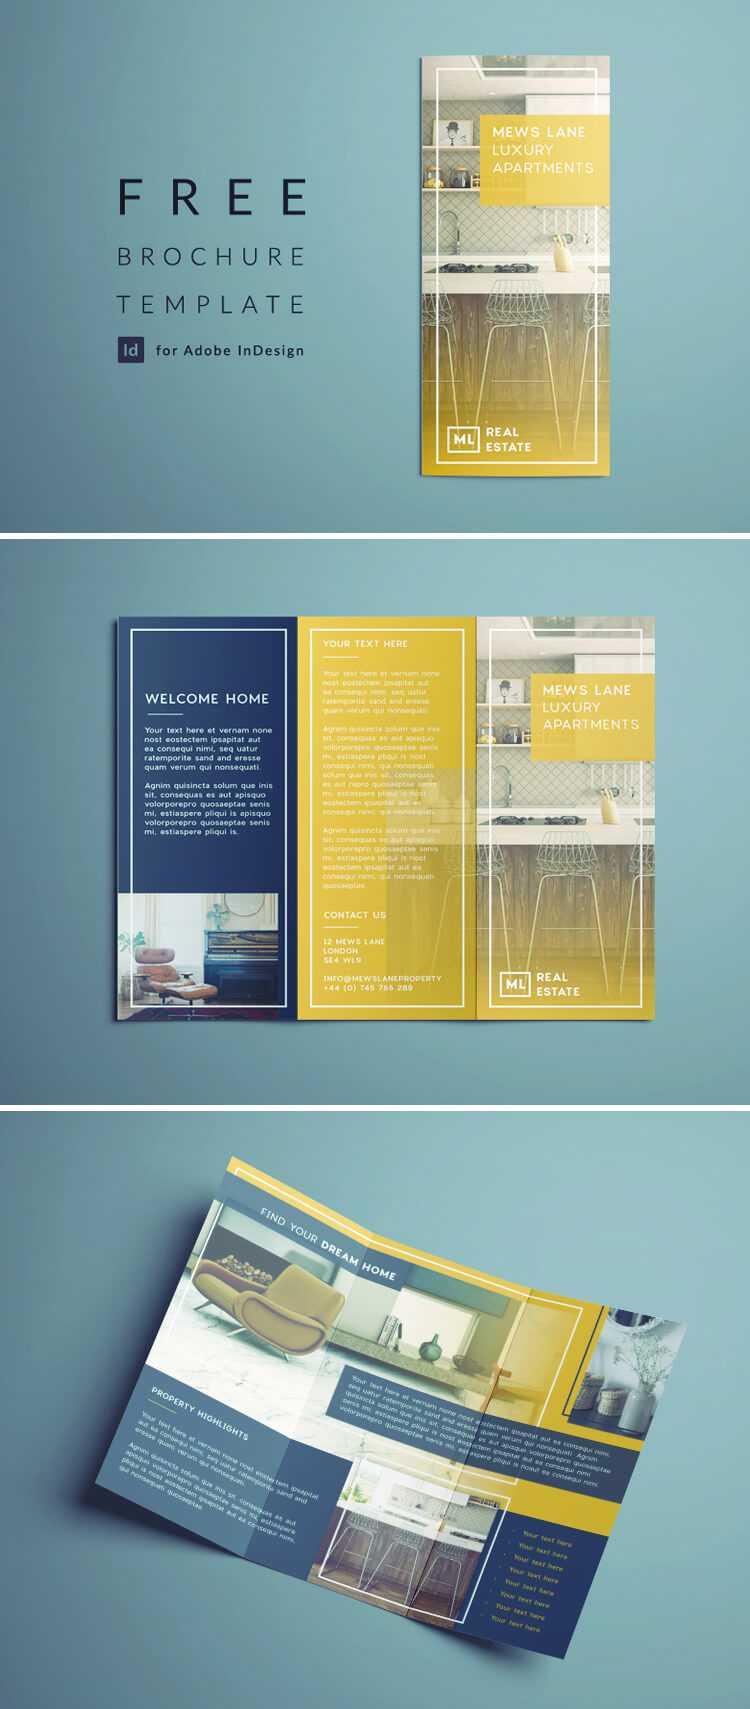 Tri Fold Brochure | Free Indesign Template Intended For Z Fold Brochure Template Indesign